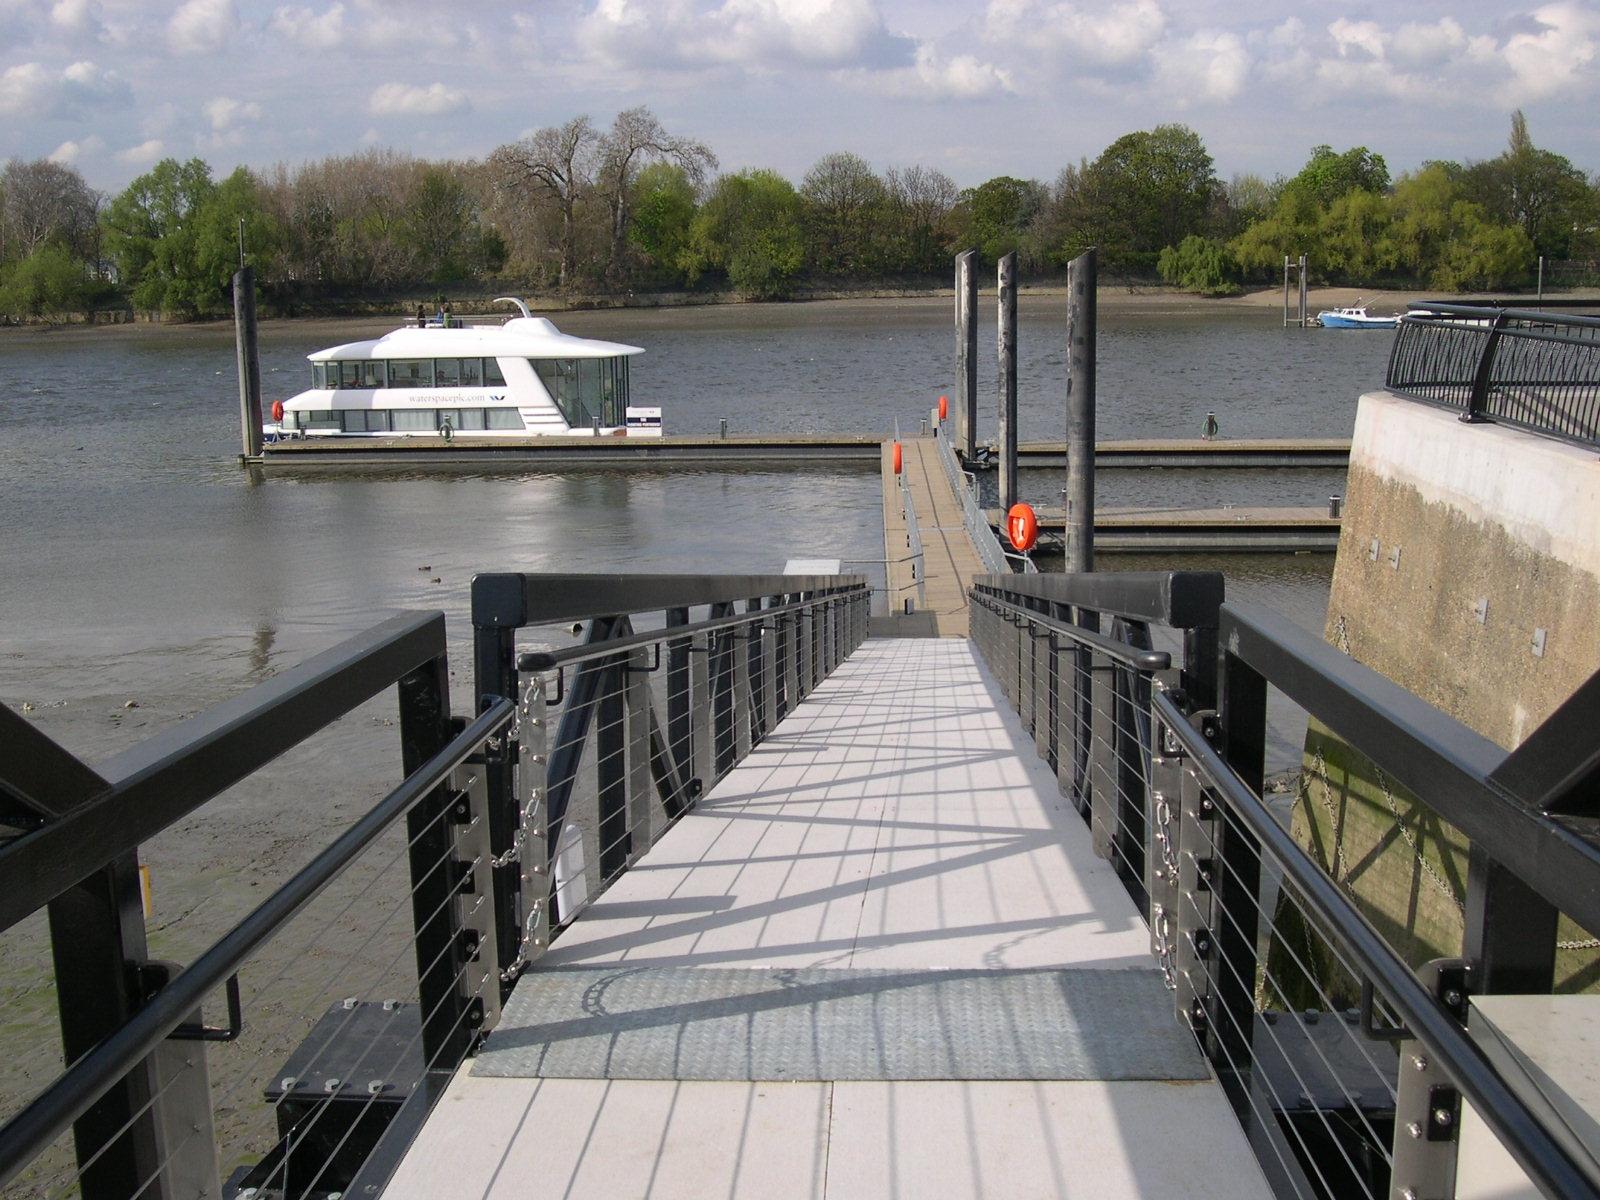 Wandsworth pontoon